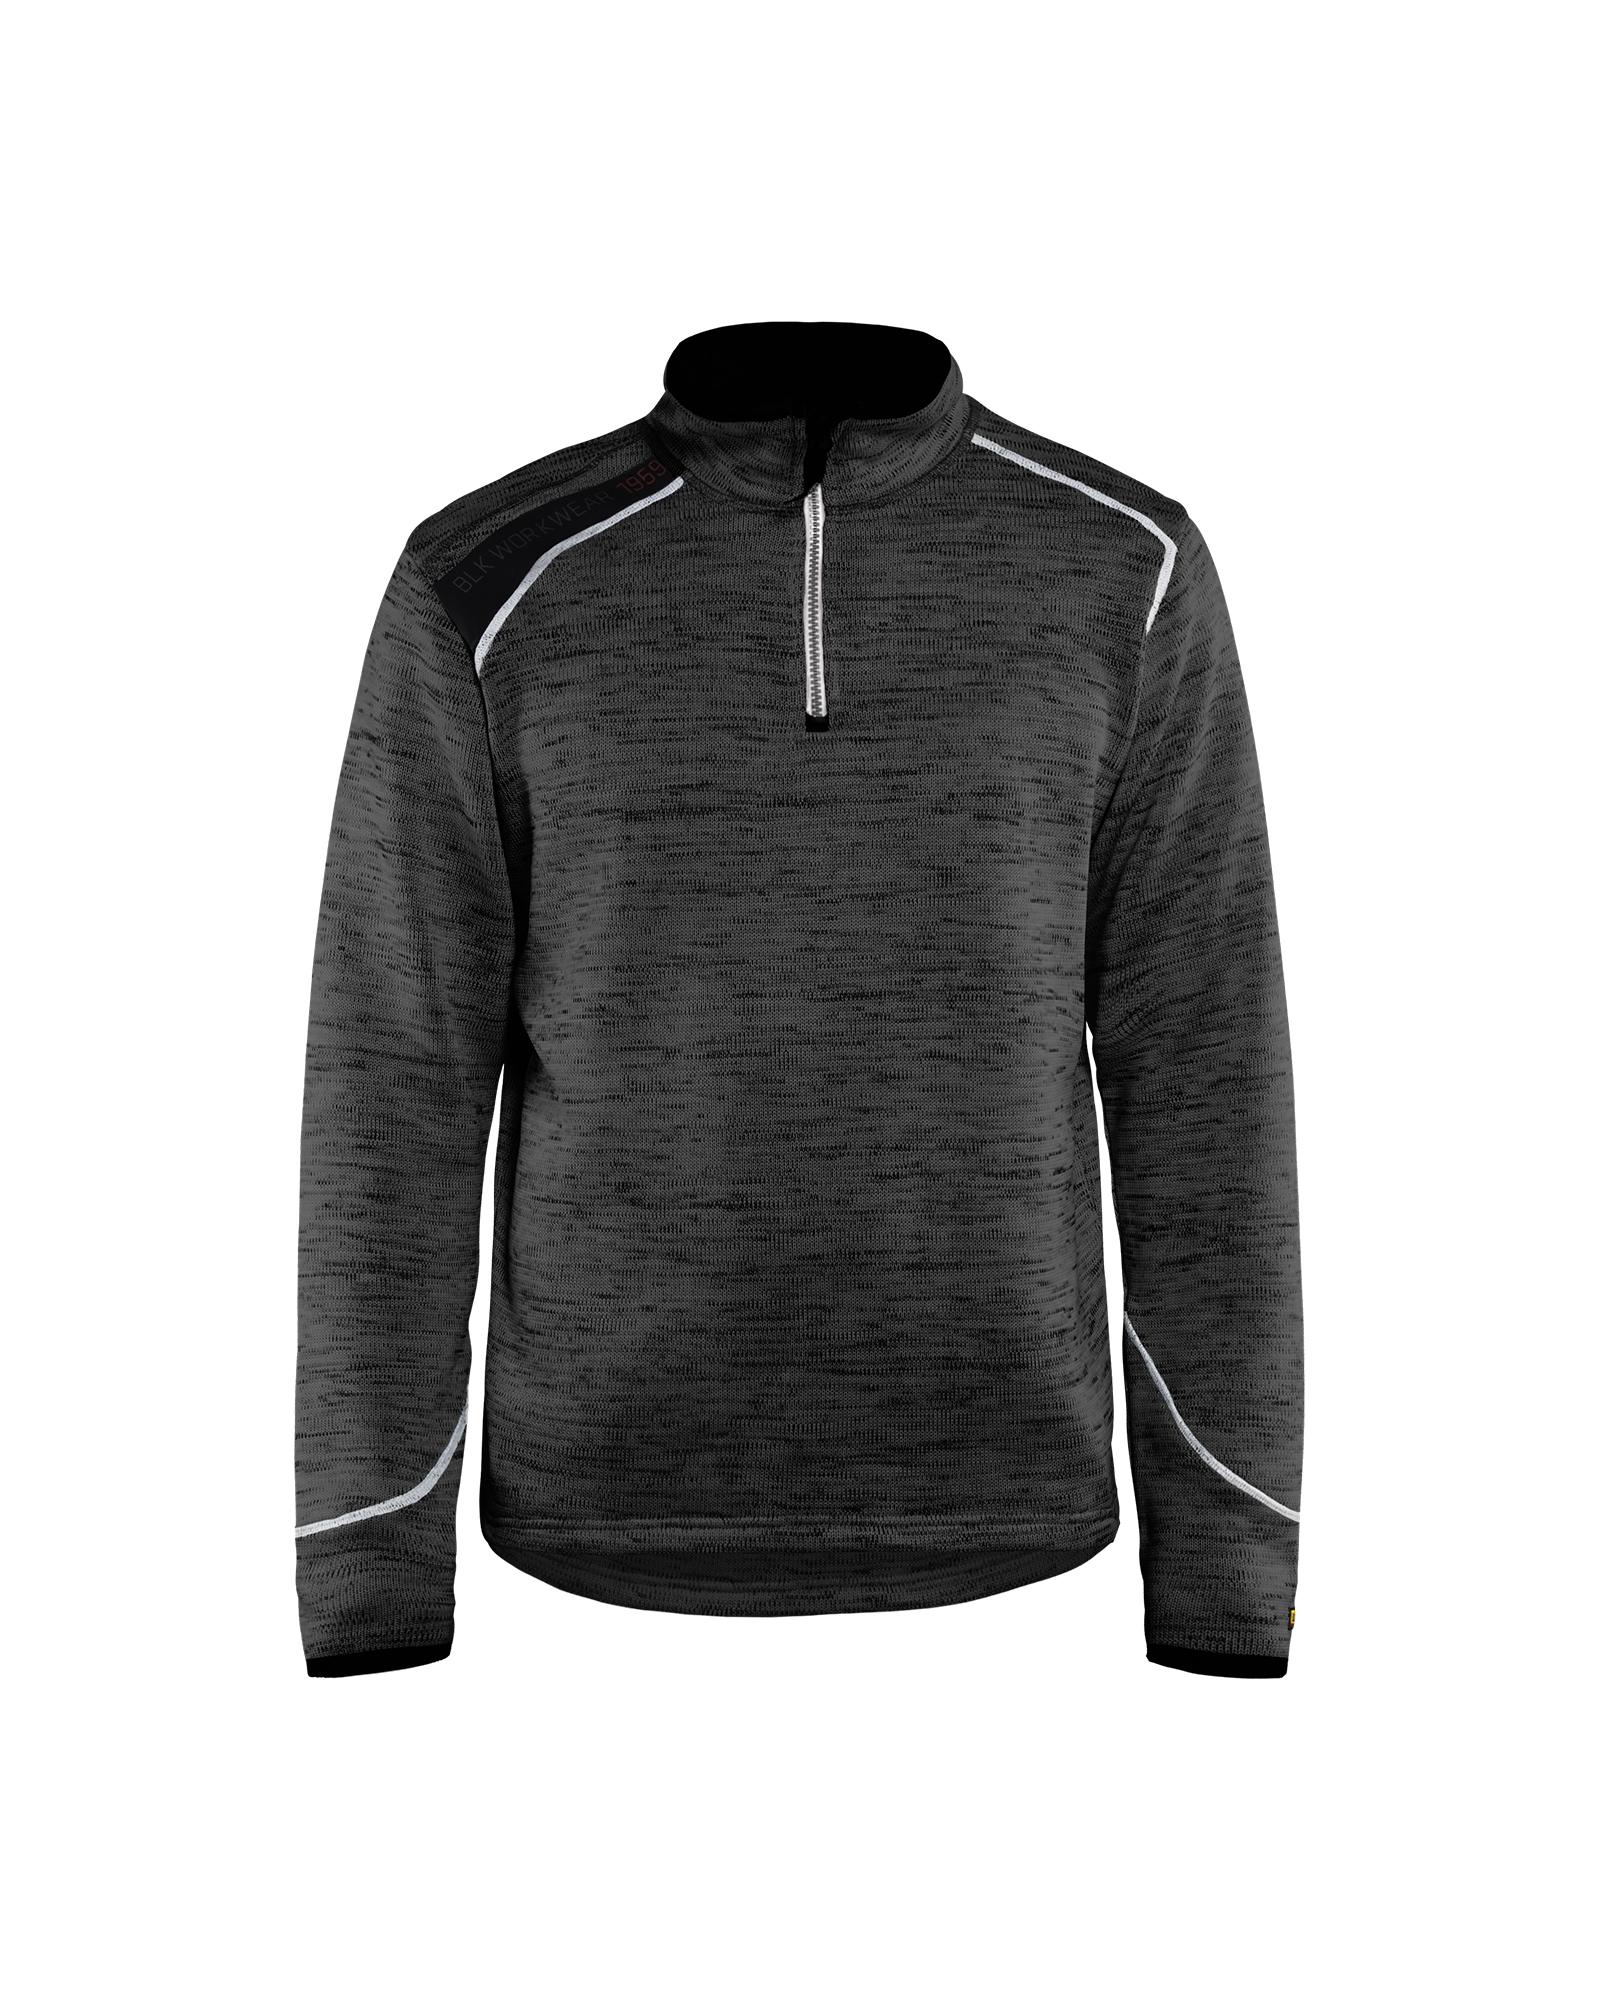 Gebreid Sweatshirt 1/2 rits